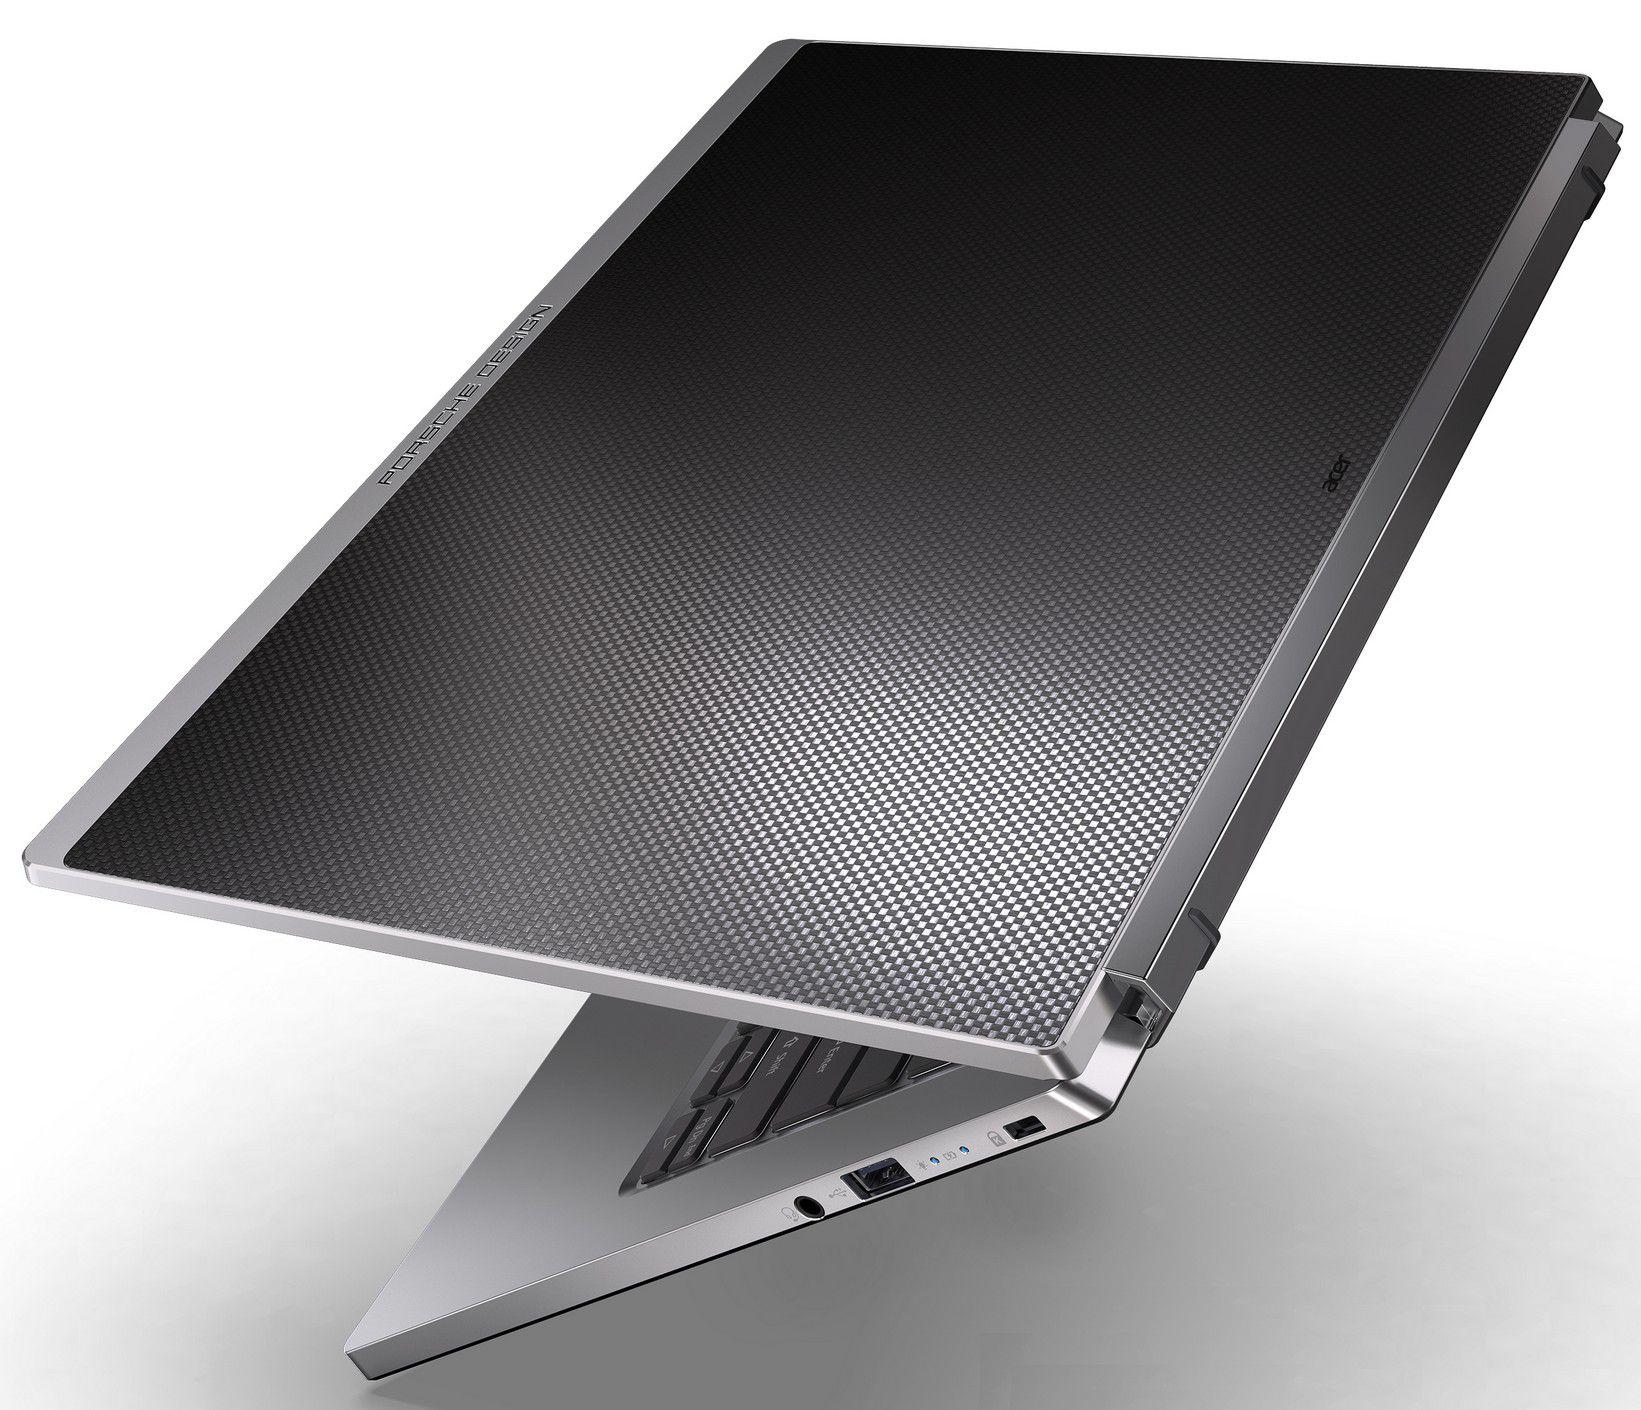 The carbon fiber top case of the Porsche Designs Acer Book RS laptop.